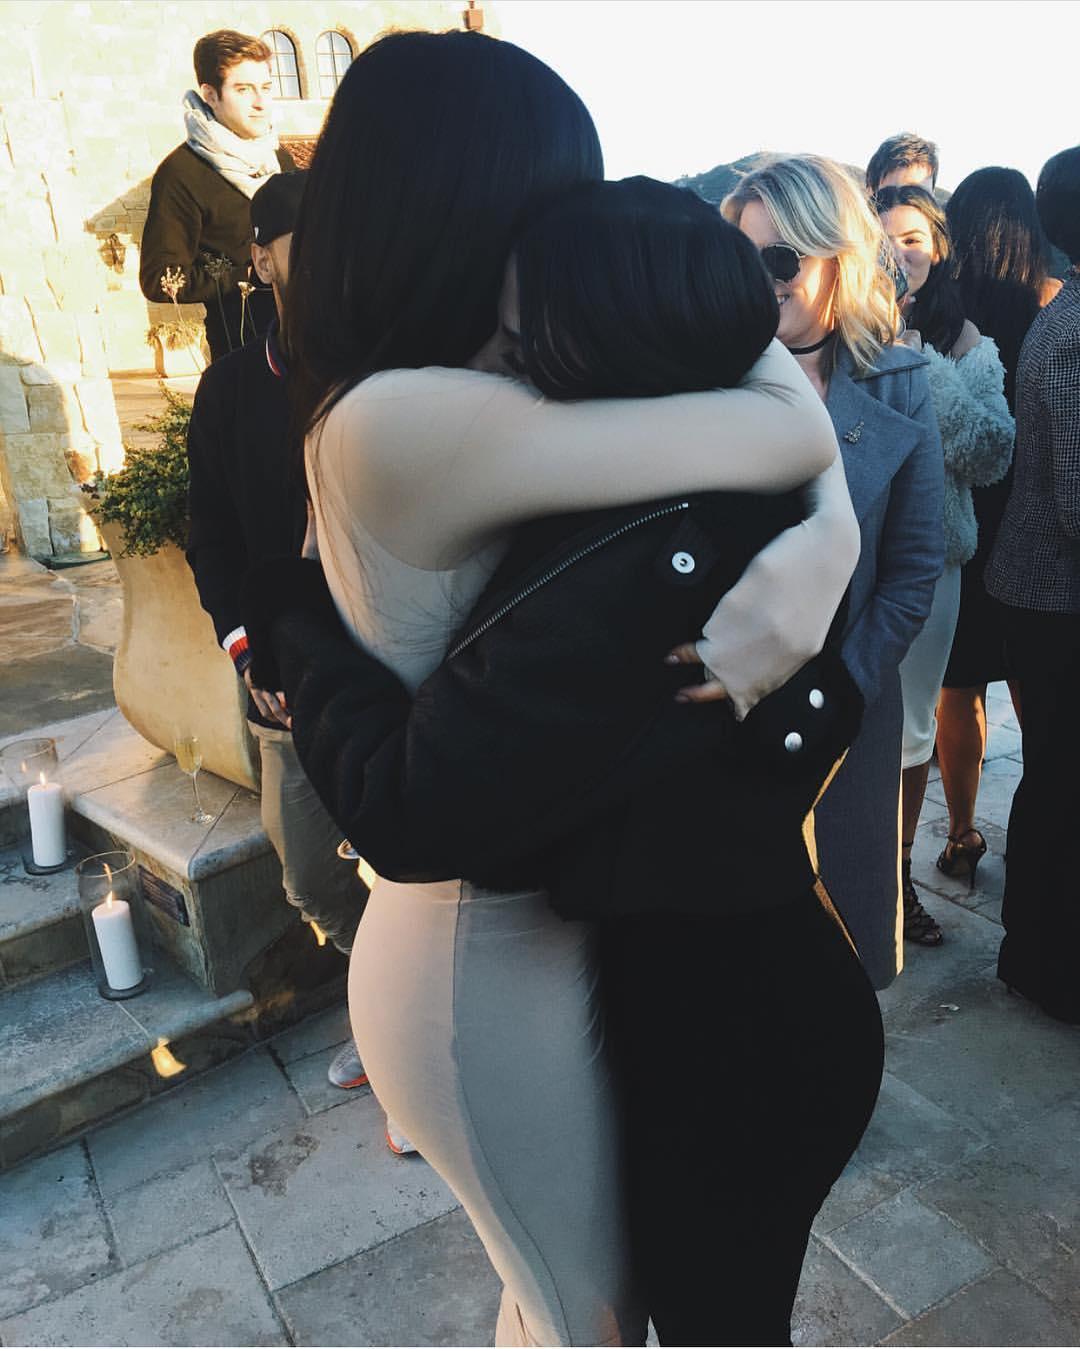 Kylie Jenner Hugging Assistant Victoria Villarroel Gamero